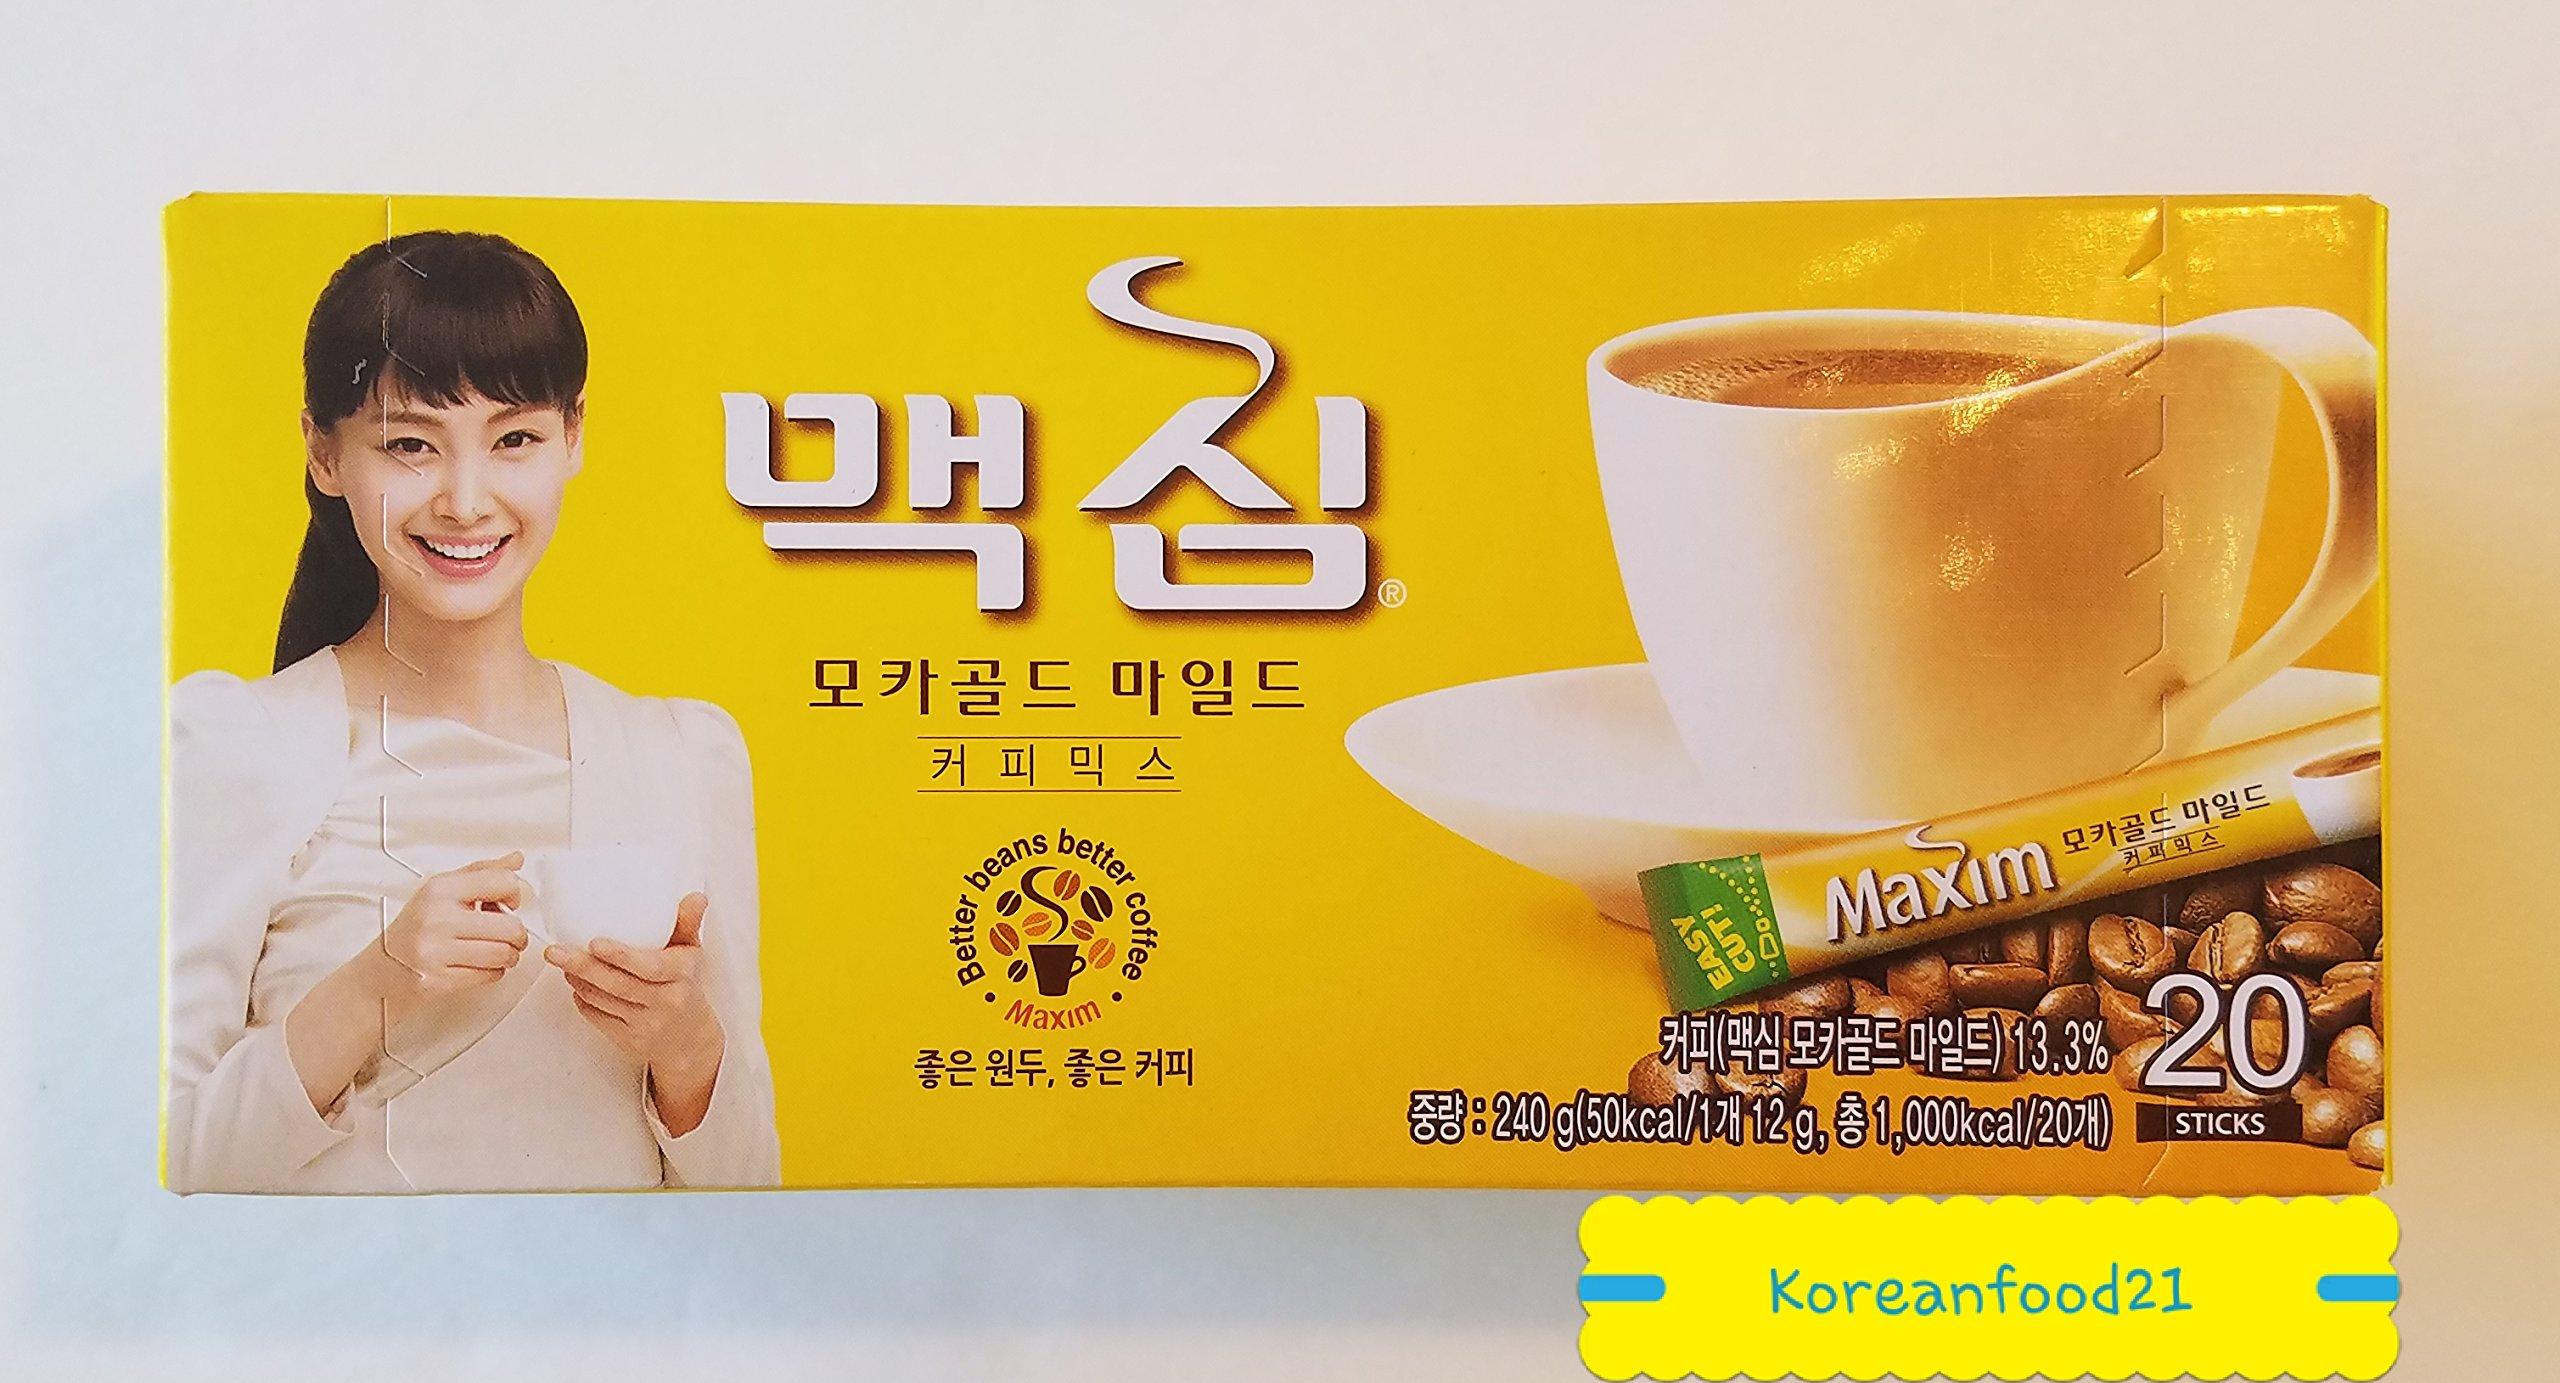 DONGSUH Maxim Mocha Gold Mild Coffee Mix (20sticks)